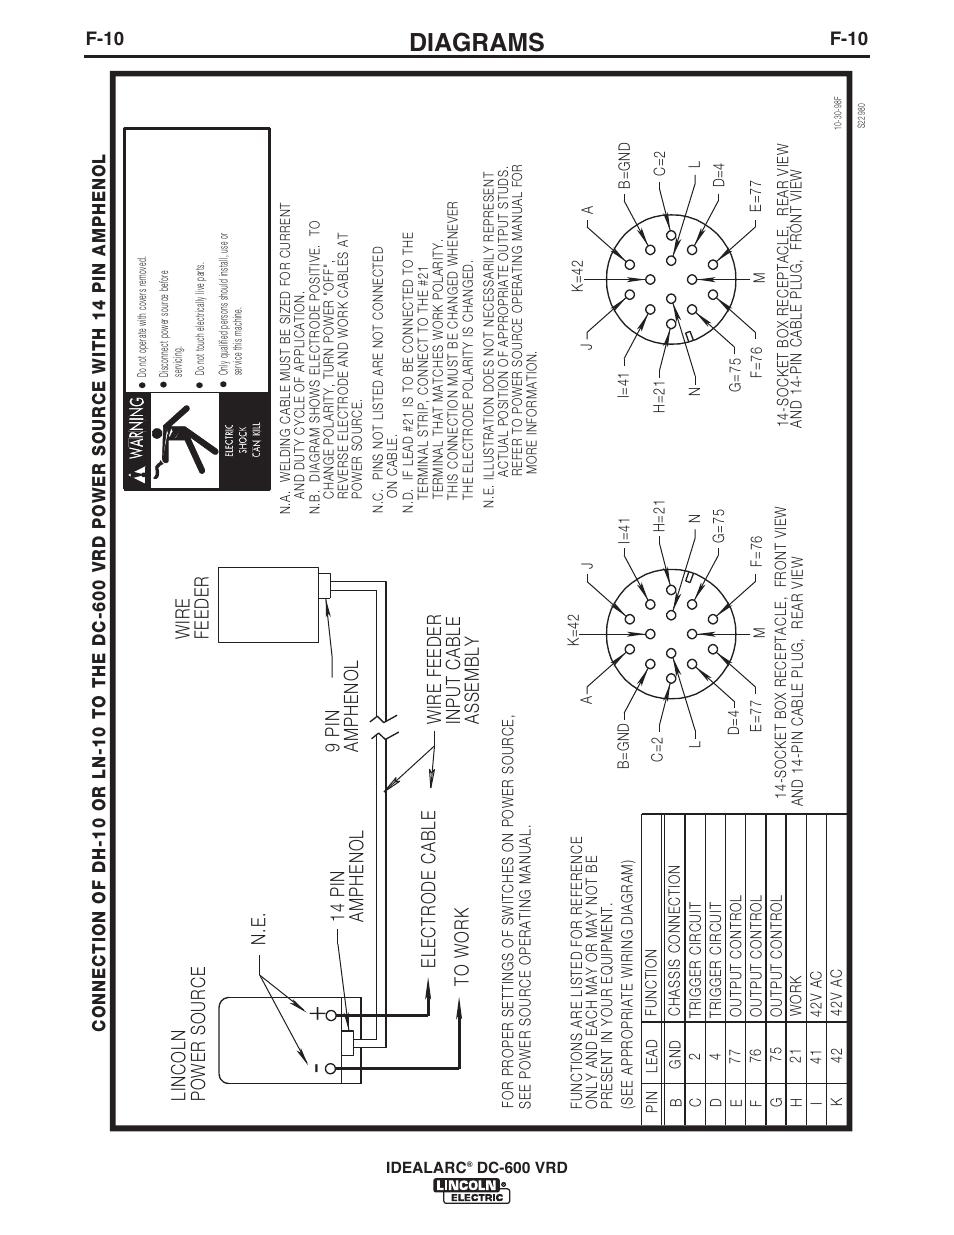 Idealarc Dc 600 Wiring Diagram : 30 Wiring Diagram Images